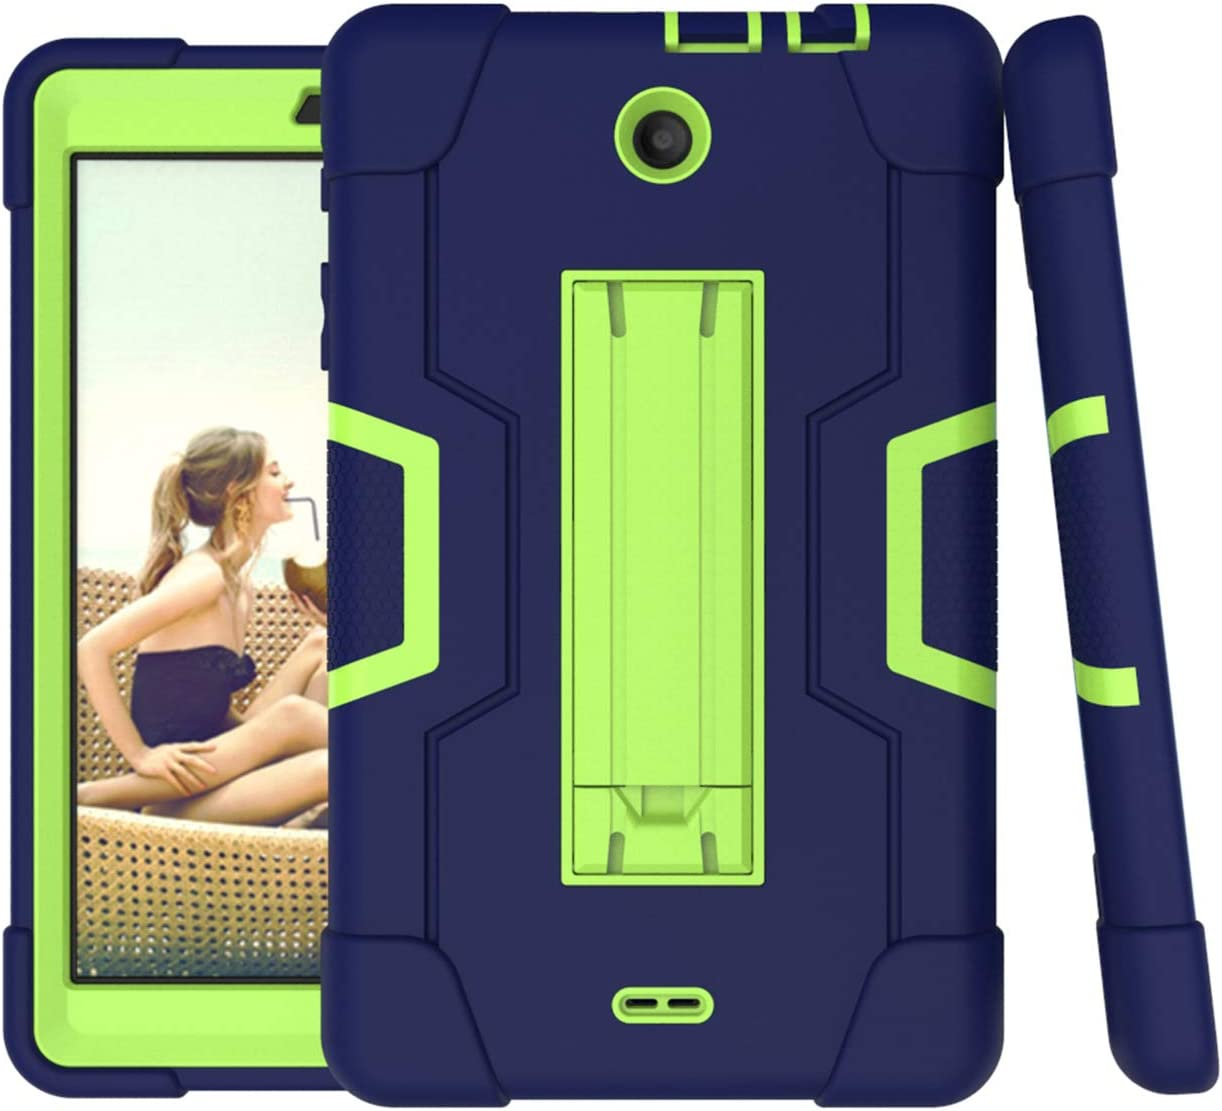 For Alcatel 3T 8.0 Case,Alcatel Joy Tab 8.0 Case,Cherrry Heavy Duty Rugged Hybrid Shockproof Full-Body Protective Case Build in Kickstand(Navy/Green)